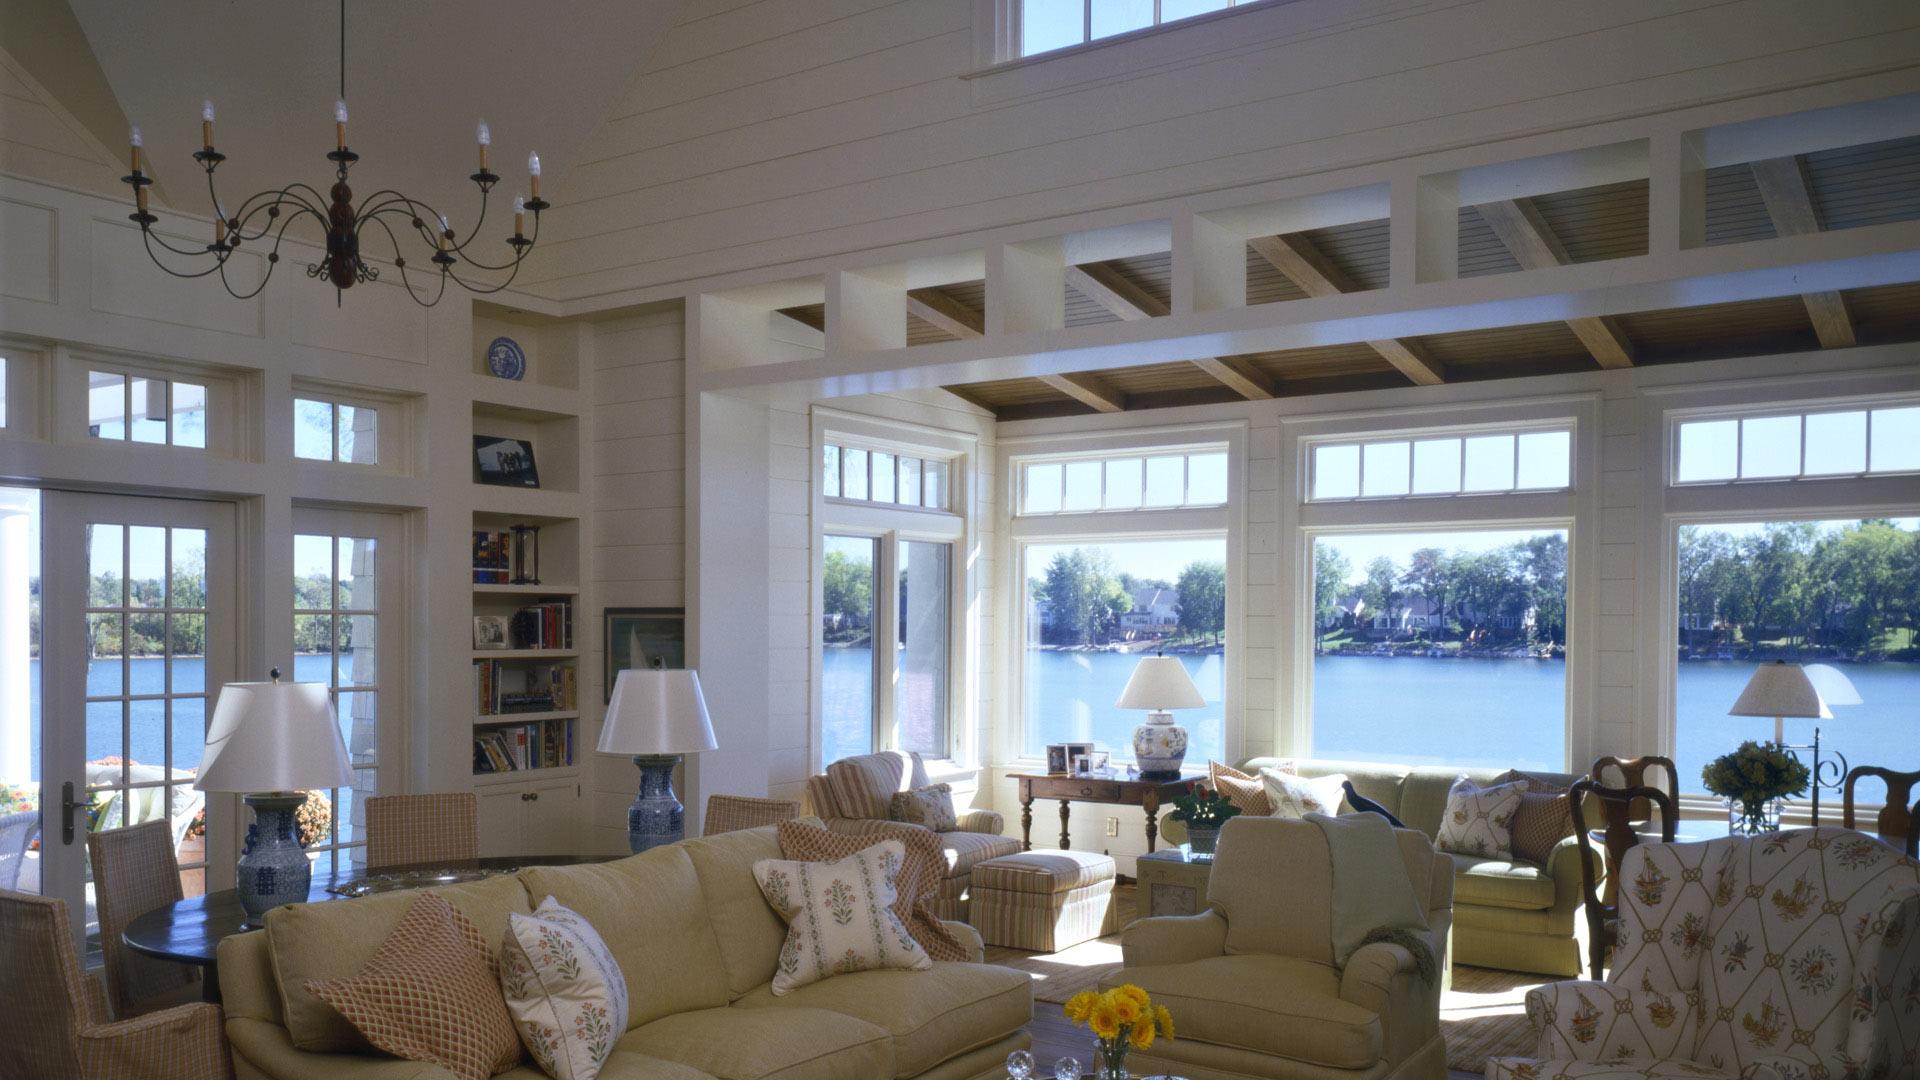 Nantucket Bay Shingle Style - Lake View - HAUS Architecture, Christopher Short, Indianapolis Architect